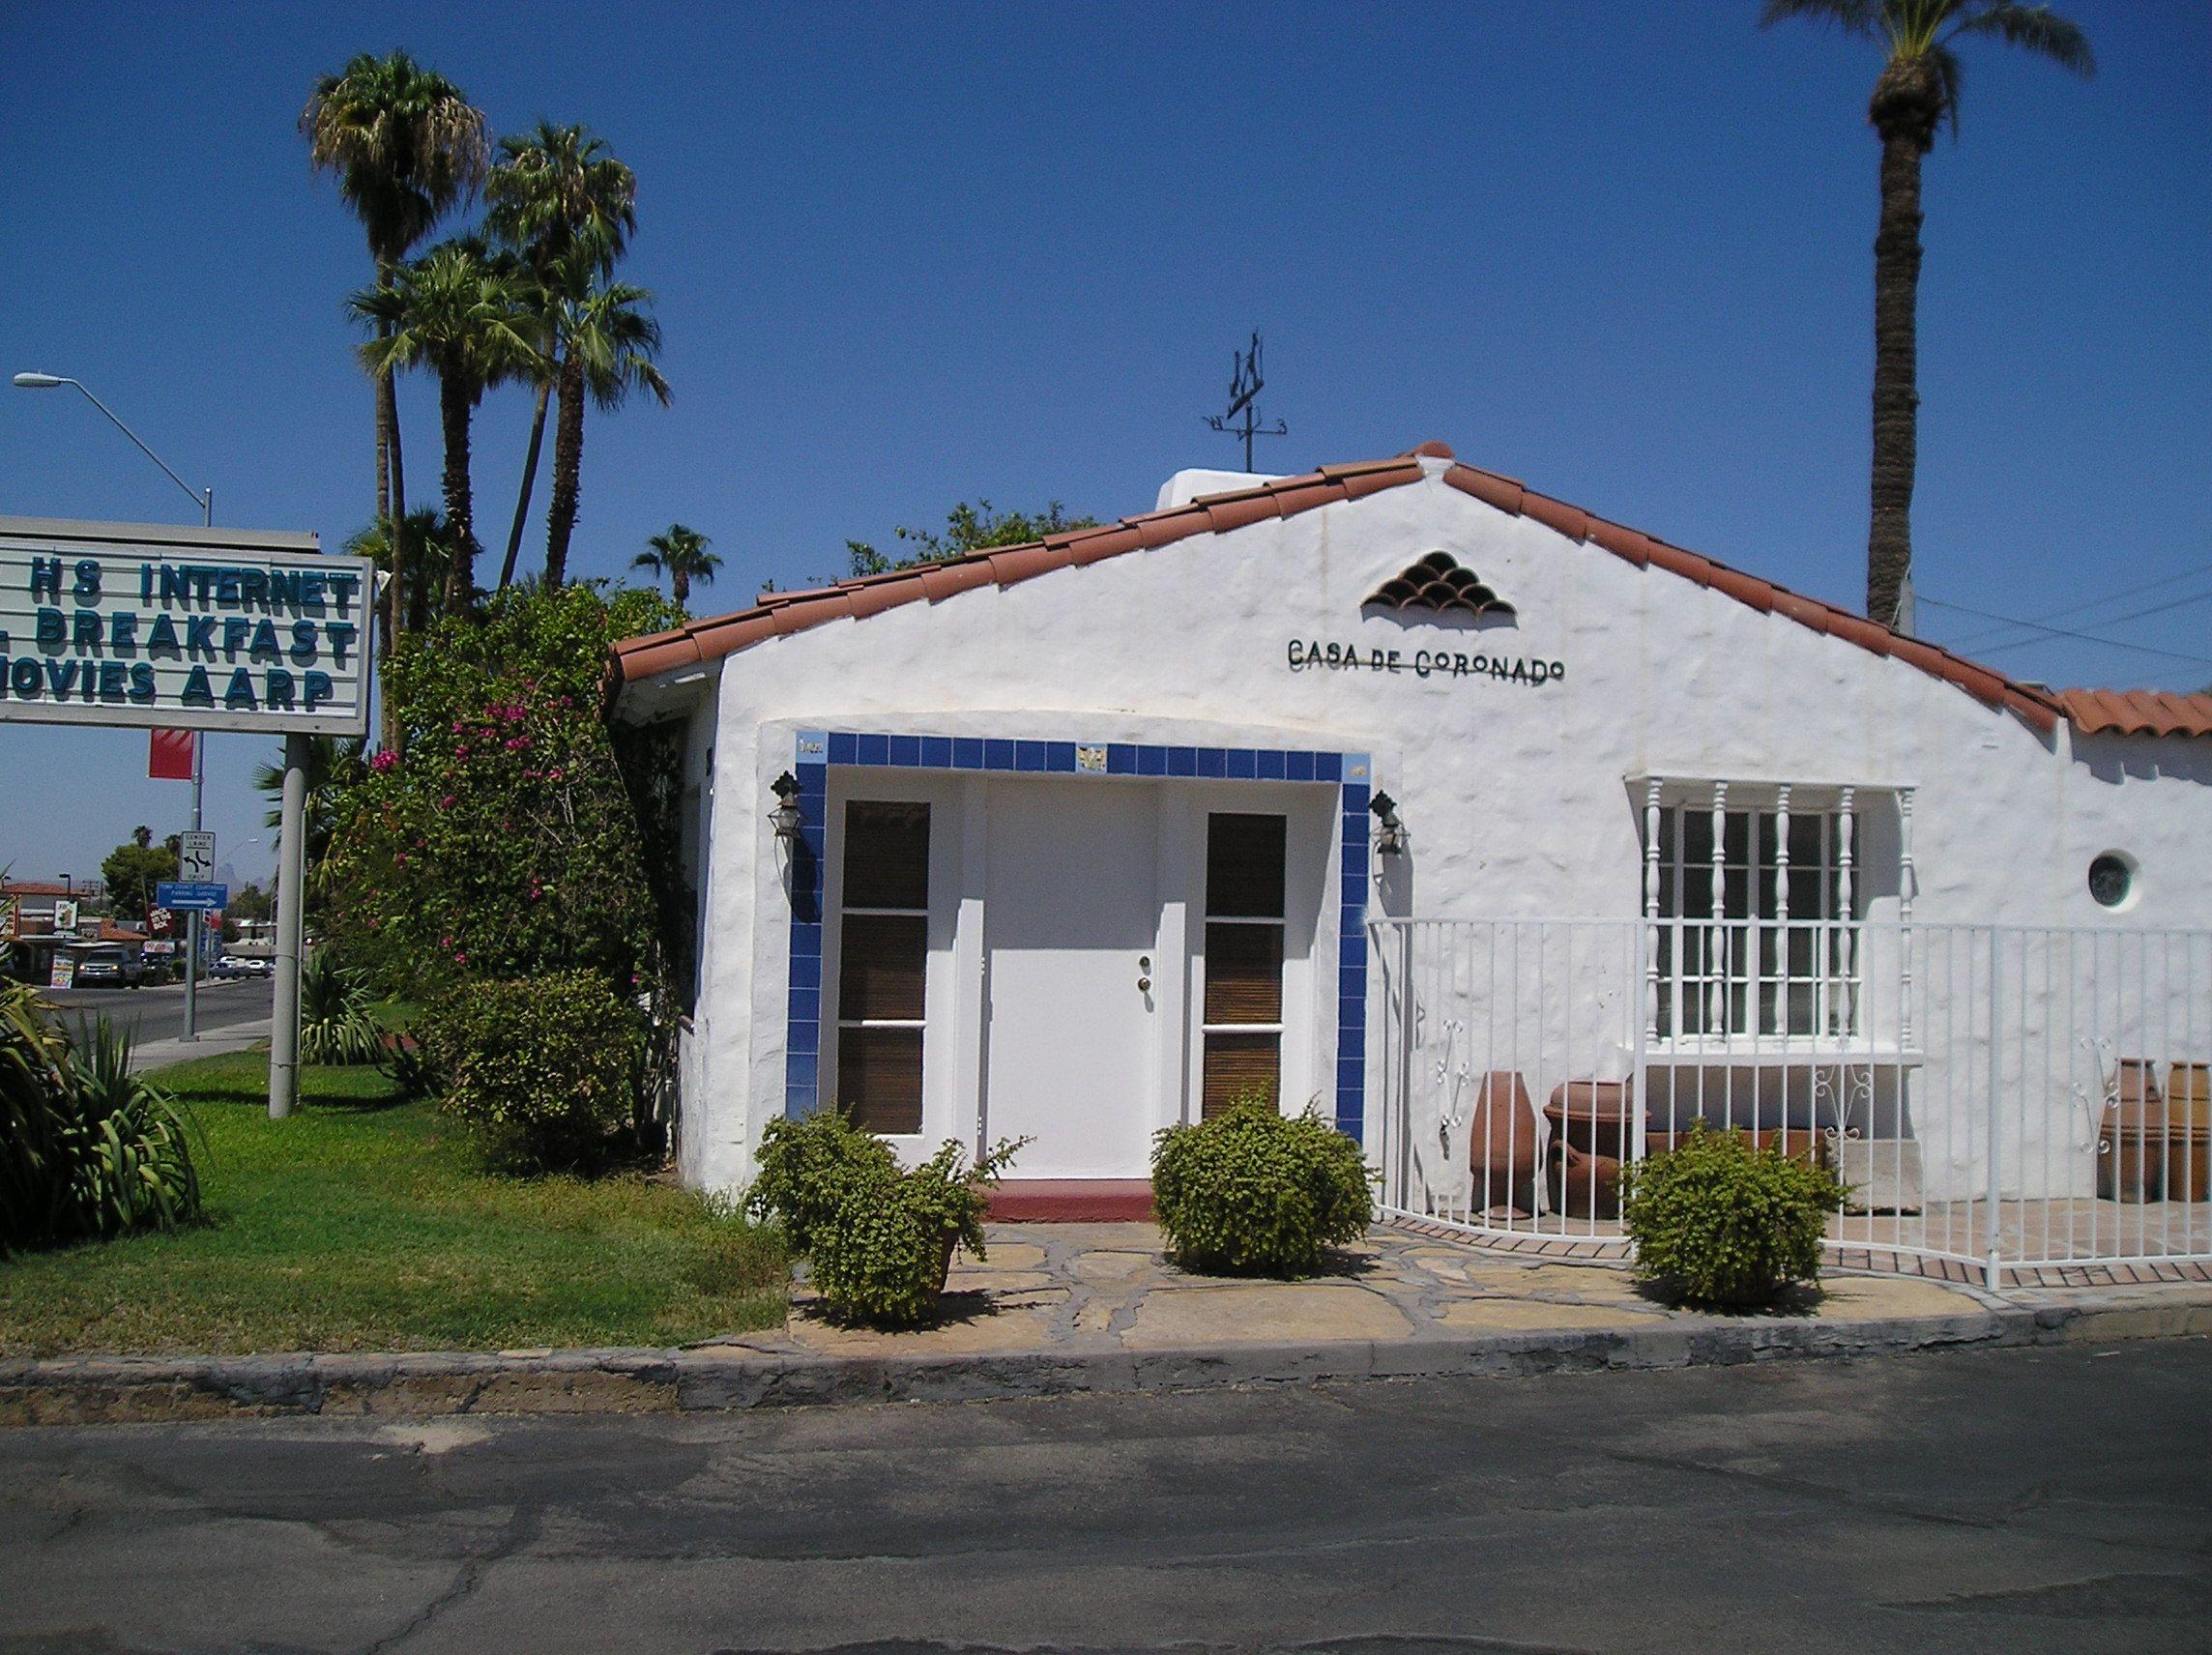 Casa de coronado museum is located in the center of the for Best western coronado motor hotel yuma az